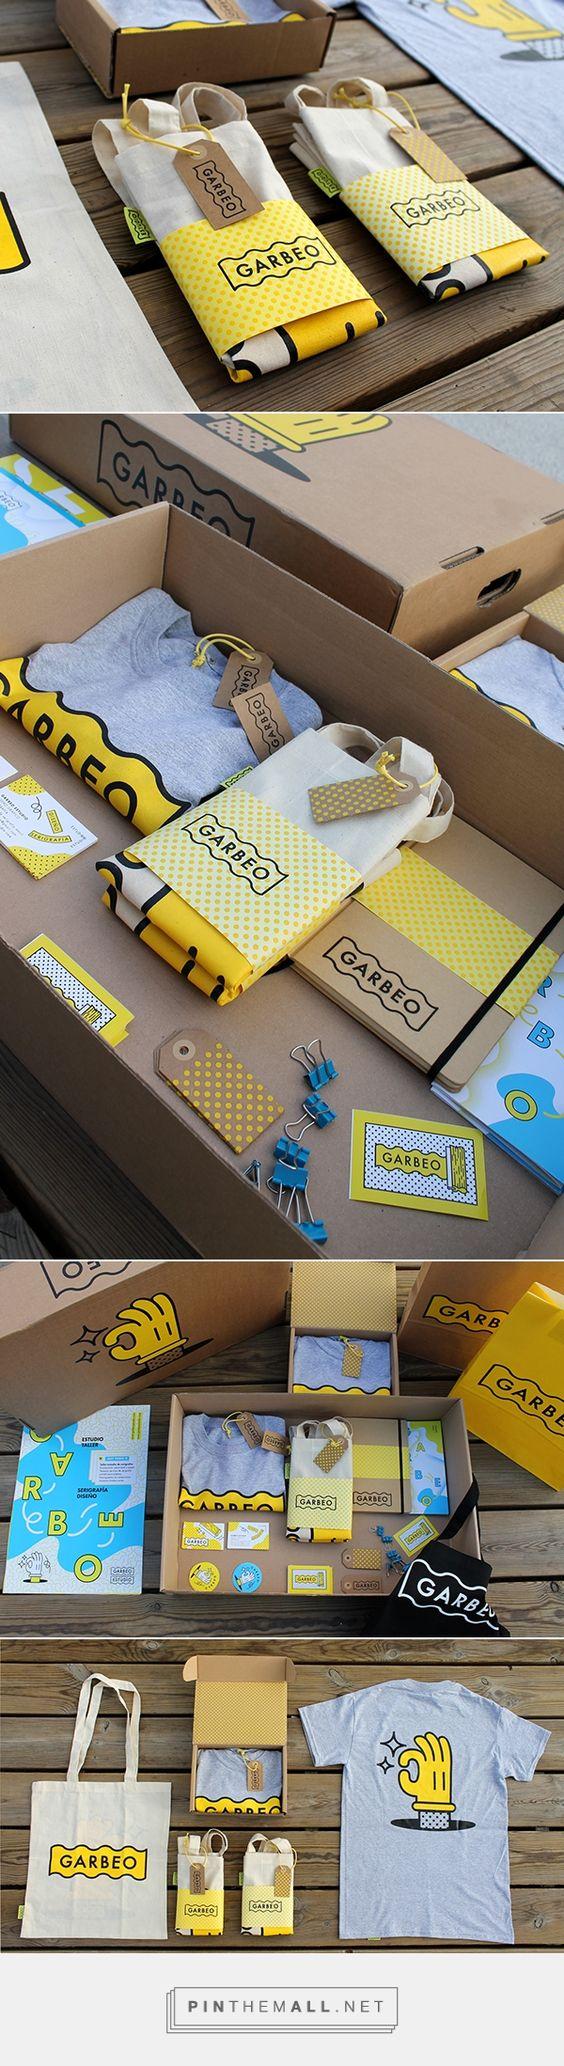 Garbeo. Promotional stuffs. via @bowlofhoney #branding #design (Join design group board at https://www.pinterest.com/aldenchong/just-a-board-of-designs/)